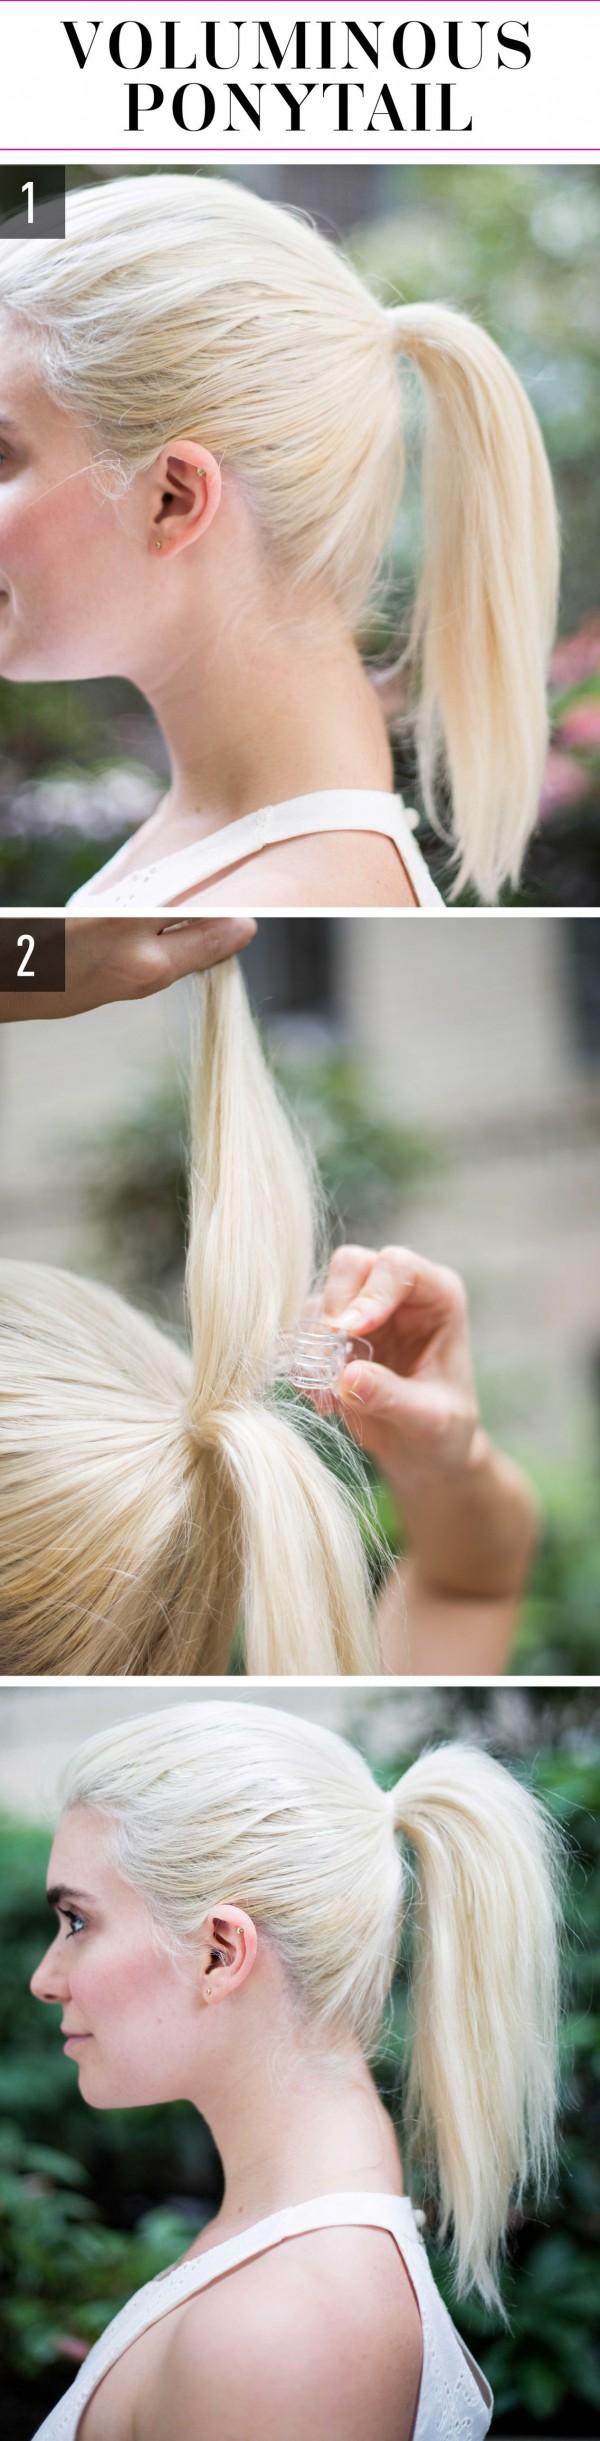 ponytail truco